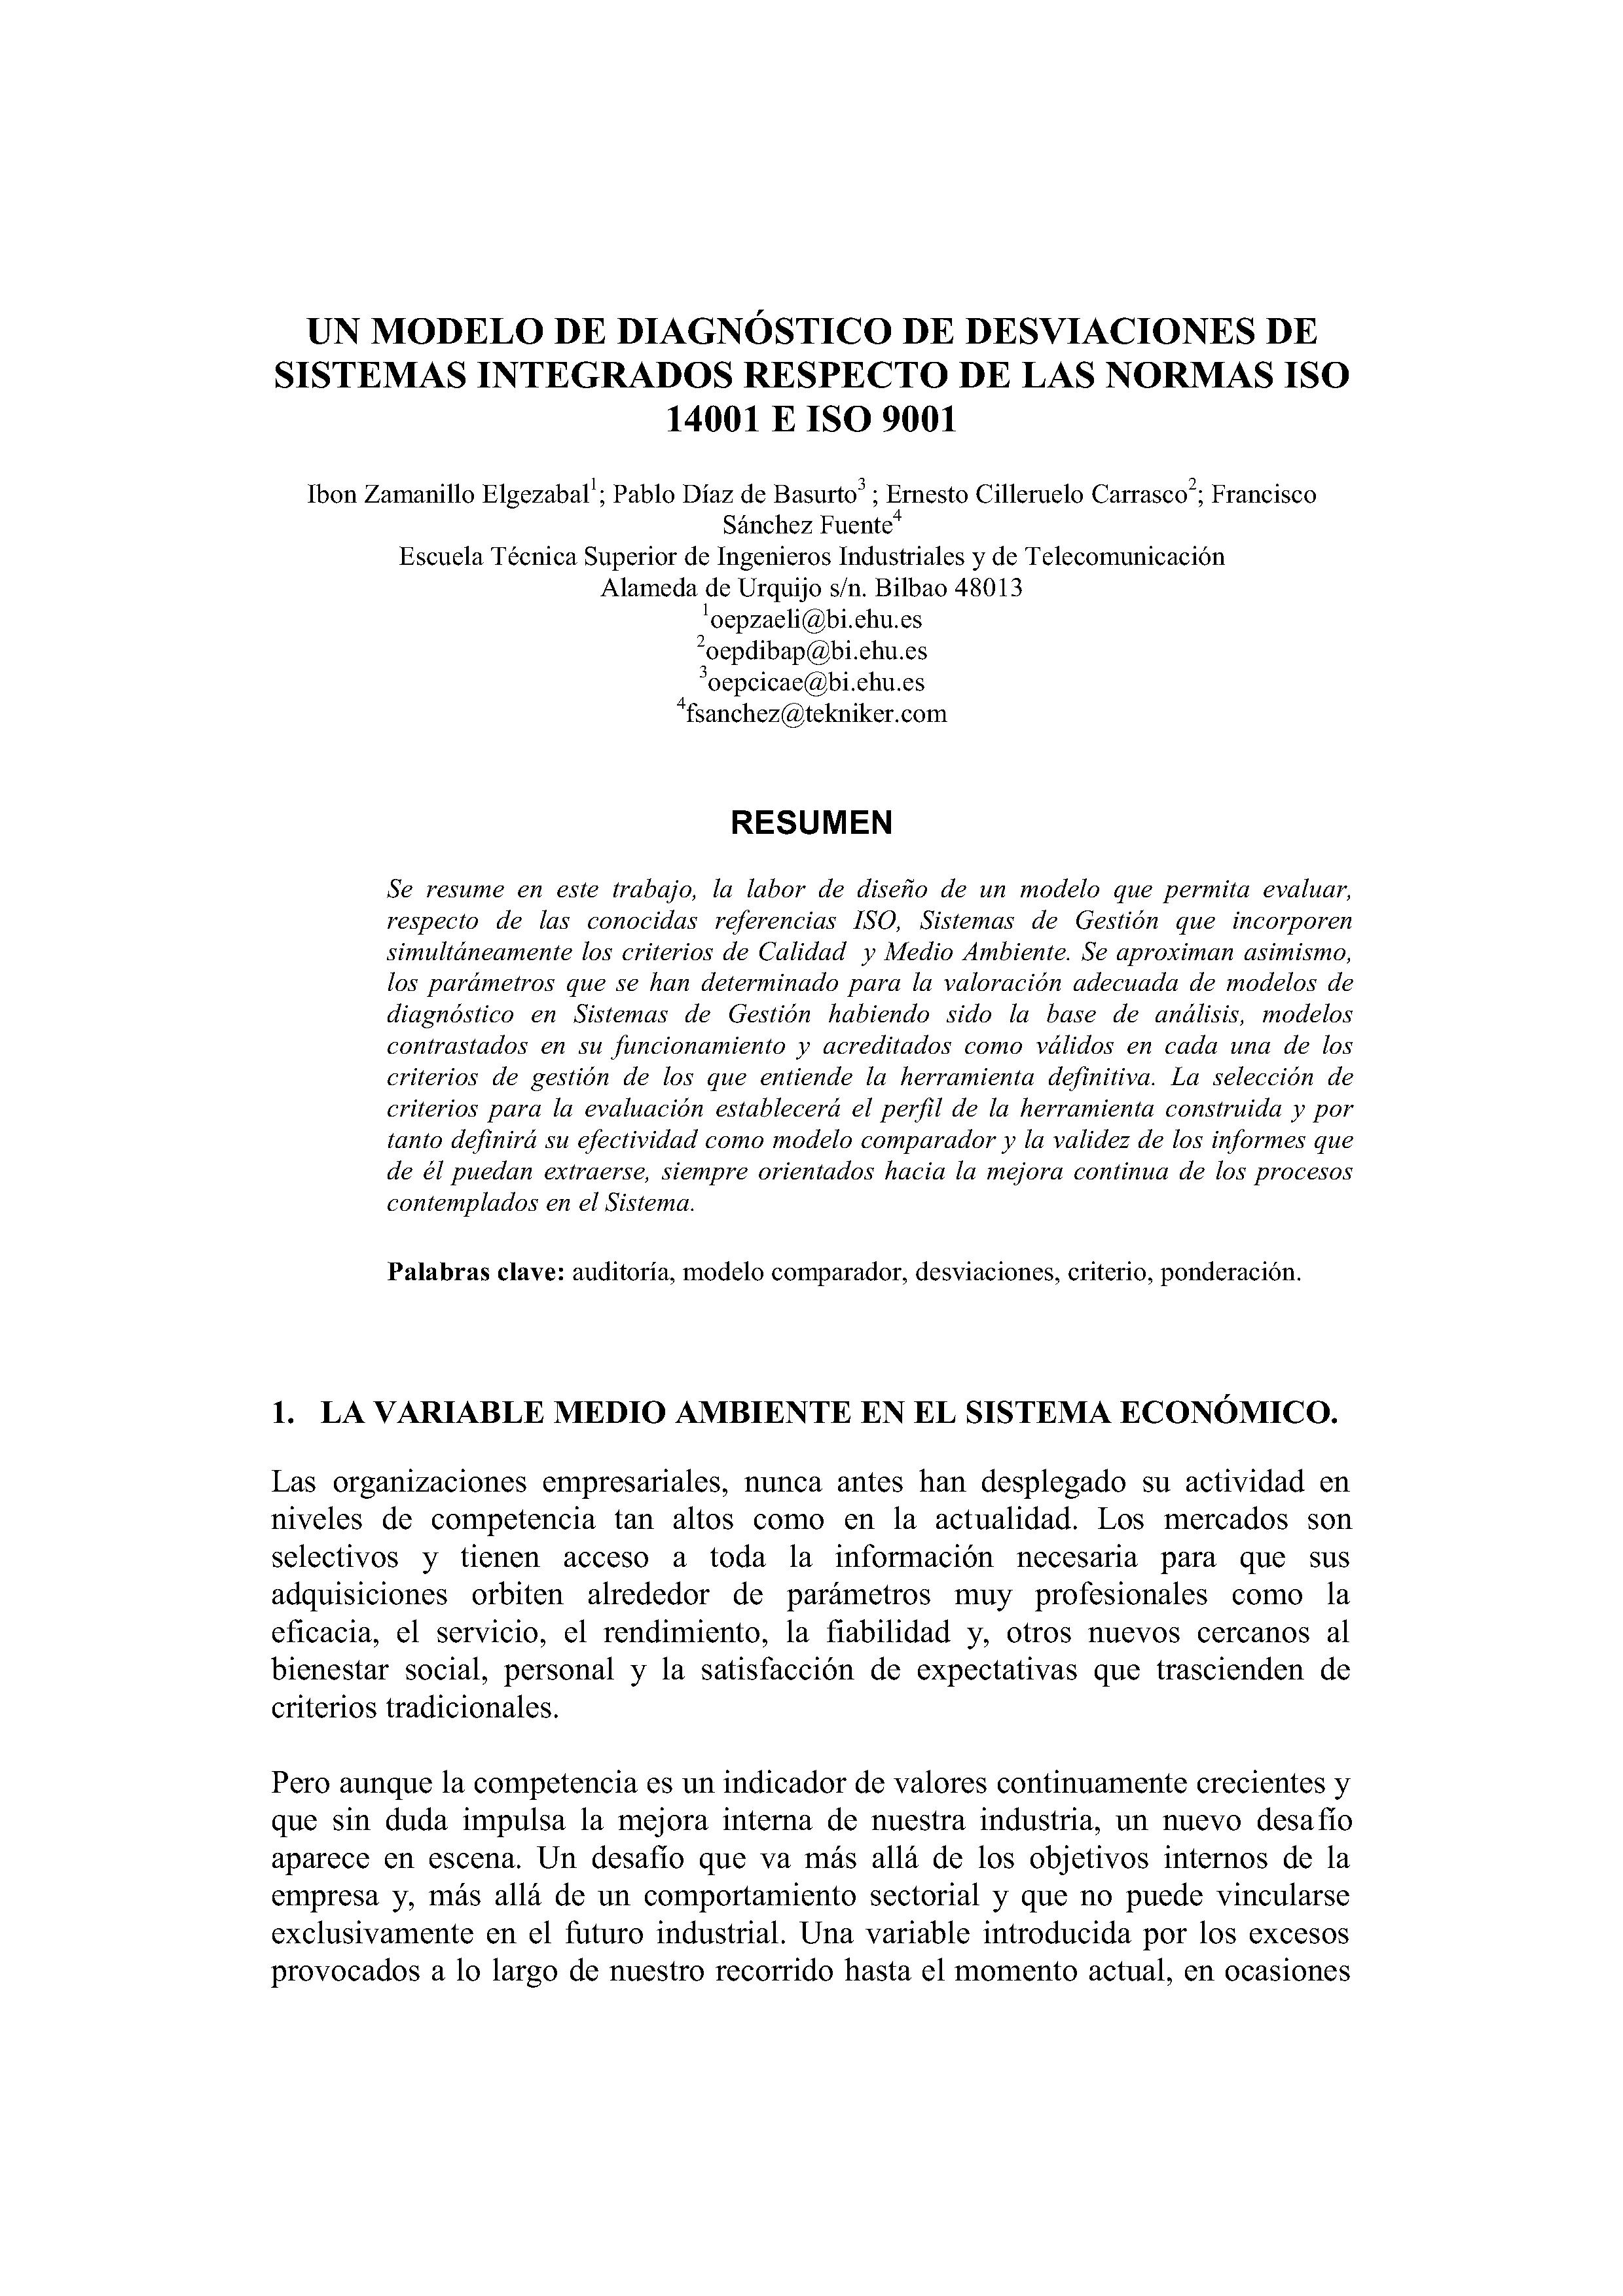 UN MODELO DE DIAGNÓSTICO DE DESVIACIONES DE SISTEMAS INTEGRADOS RESPECTO DE LAS NORMAS ISO 14001 E ISO 9001